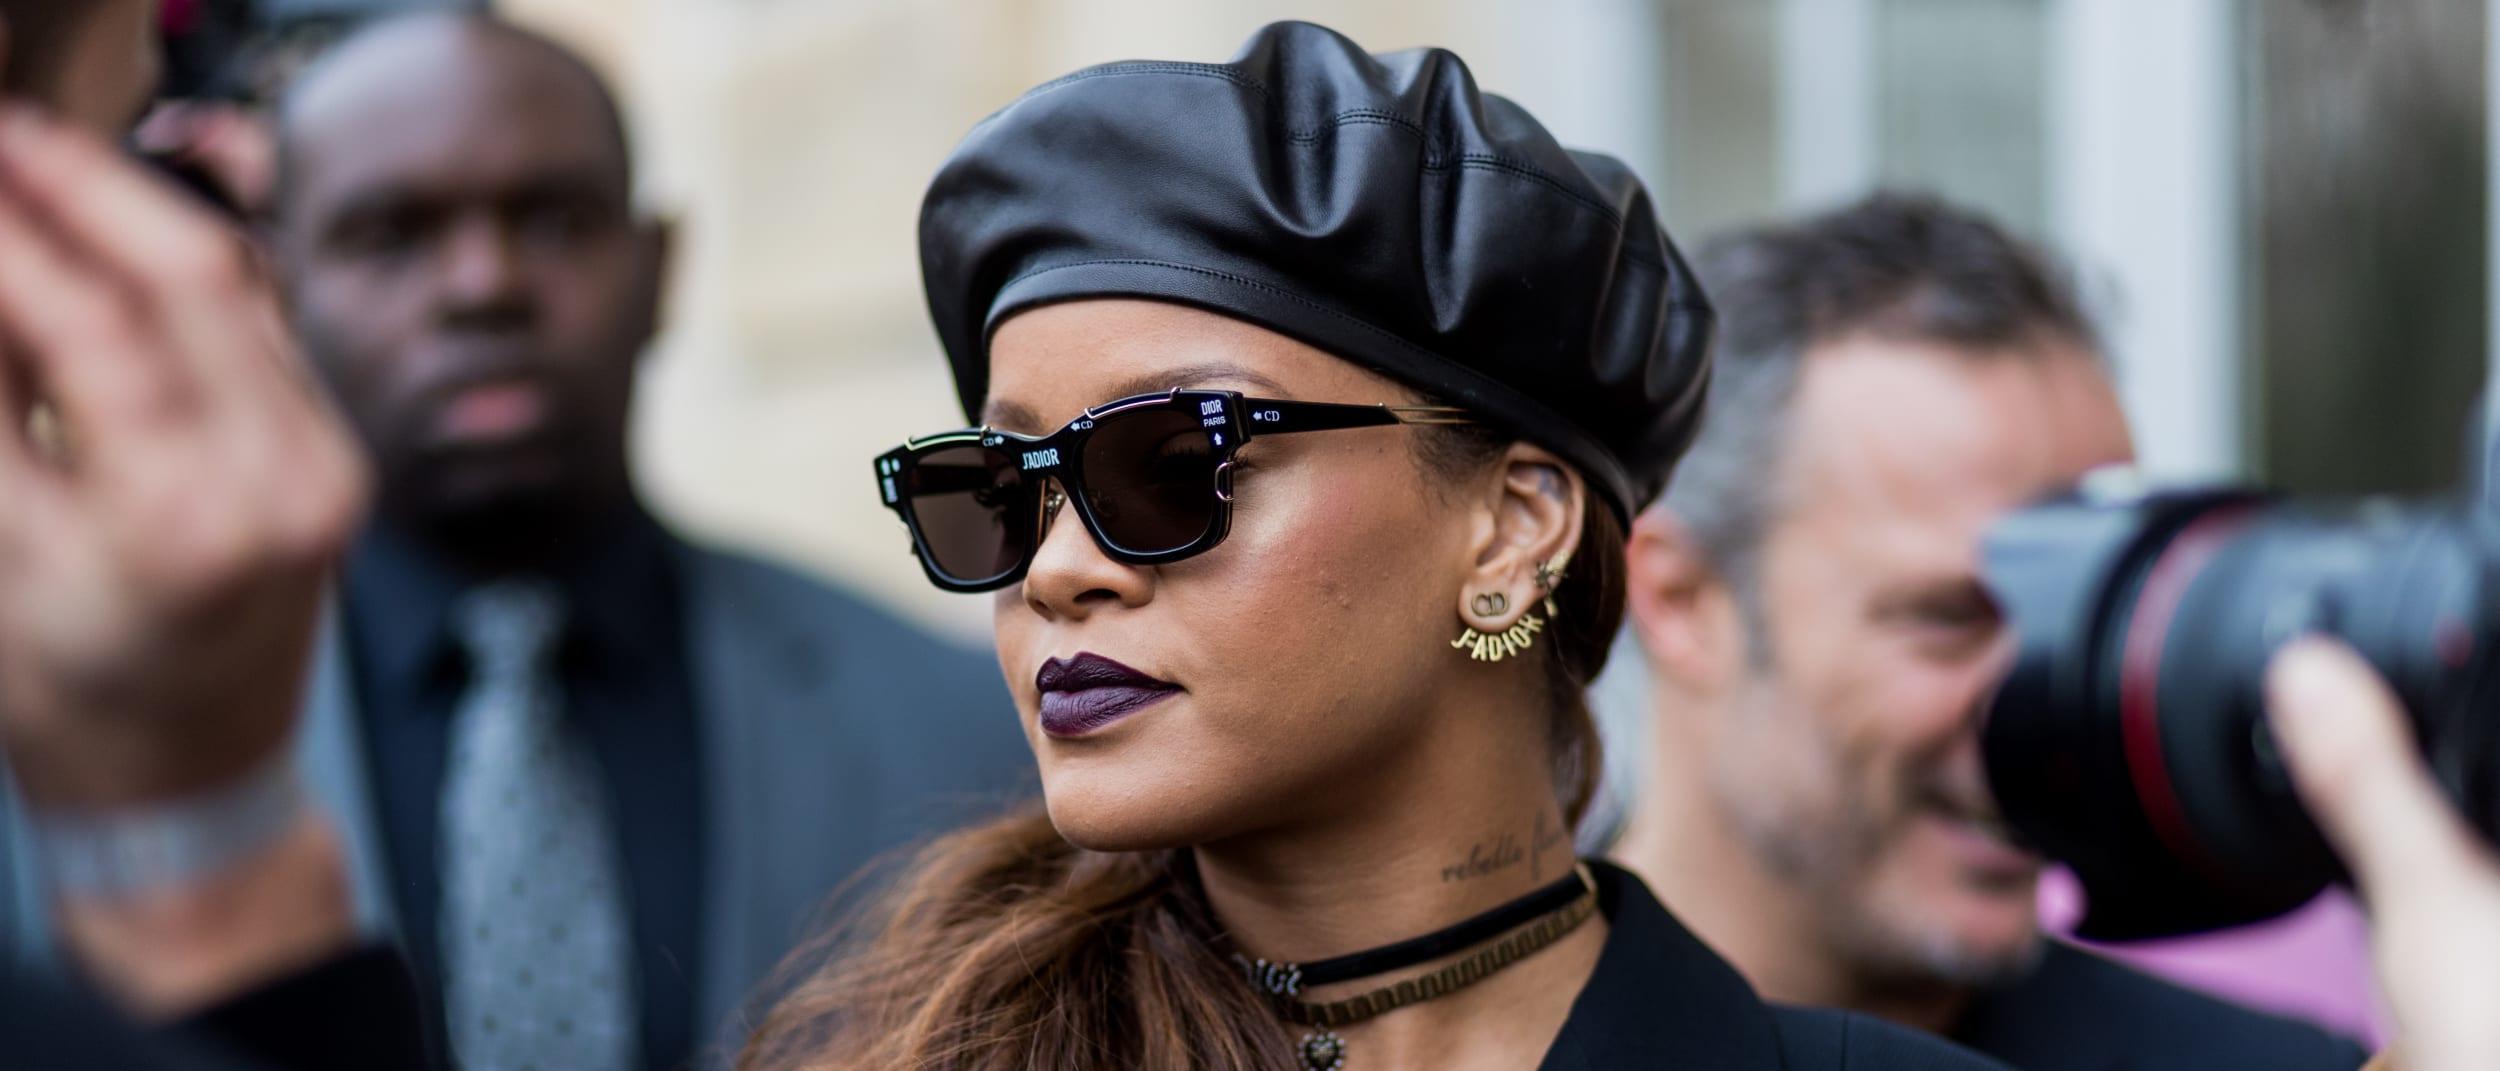 Parisian chic: forget beanies, it's beret season